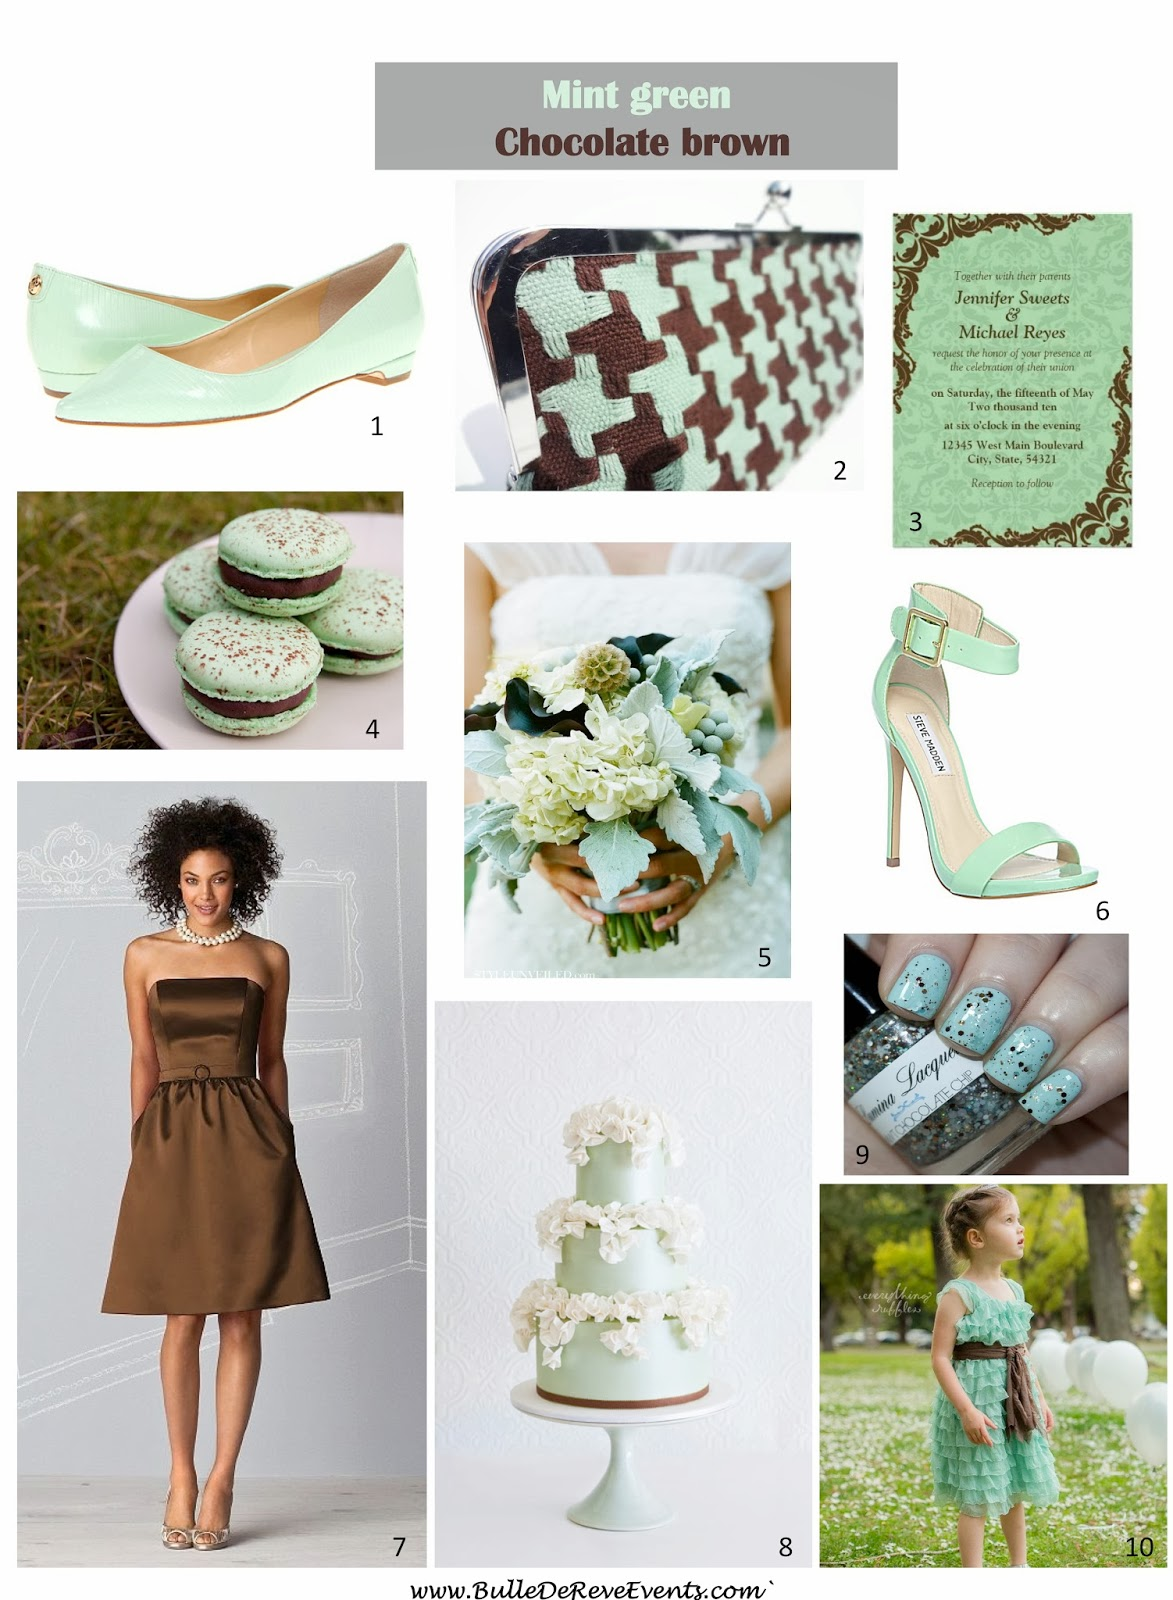 Mint Green Chocolate Brown Wedding Inspiration Board